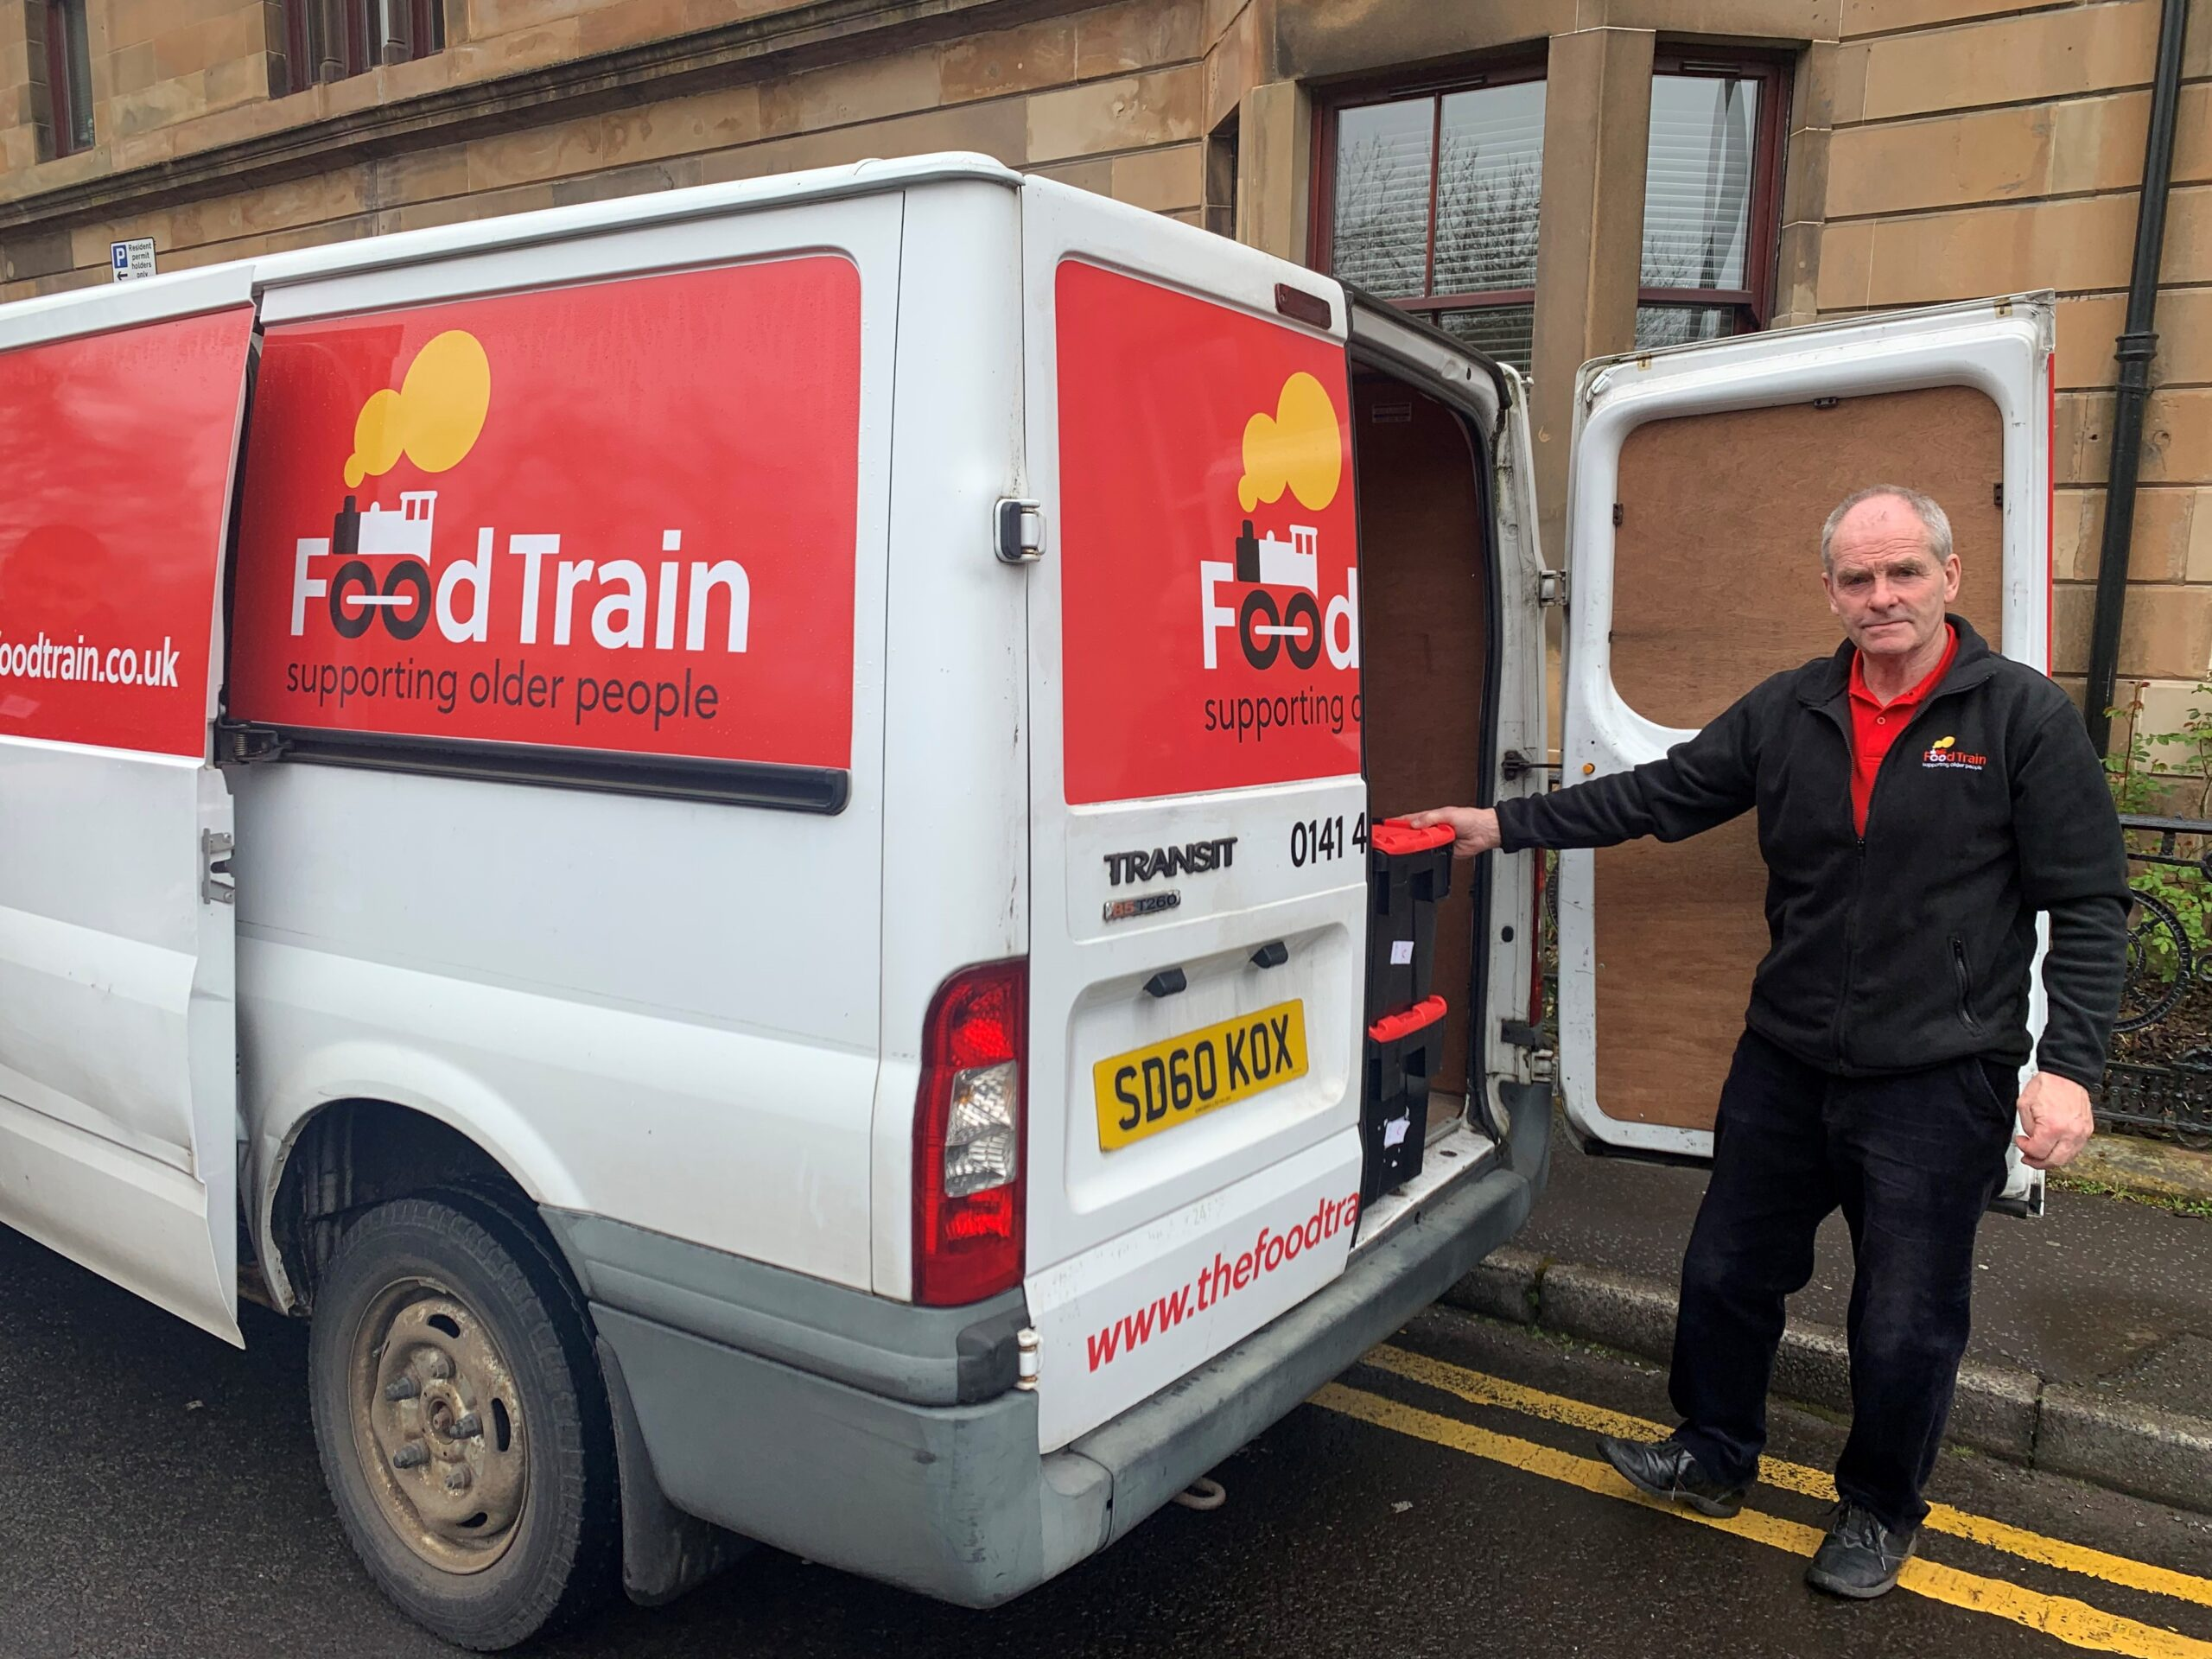 Food Train, van driver